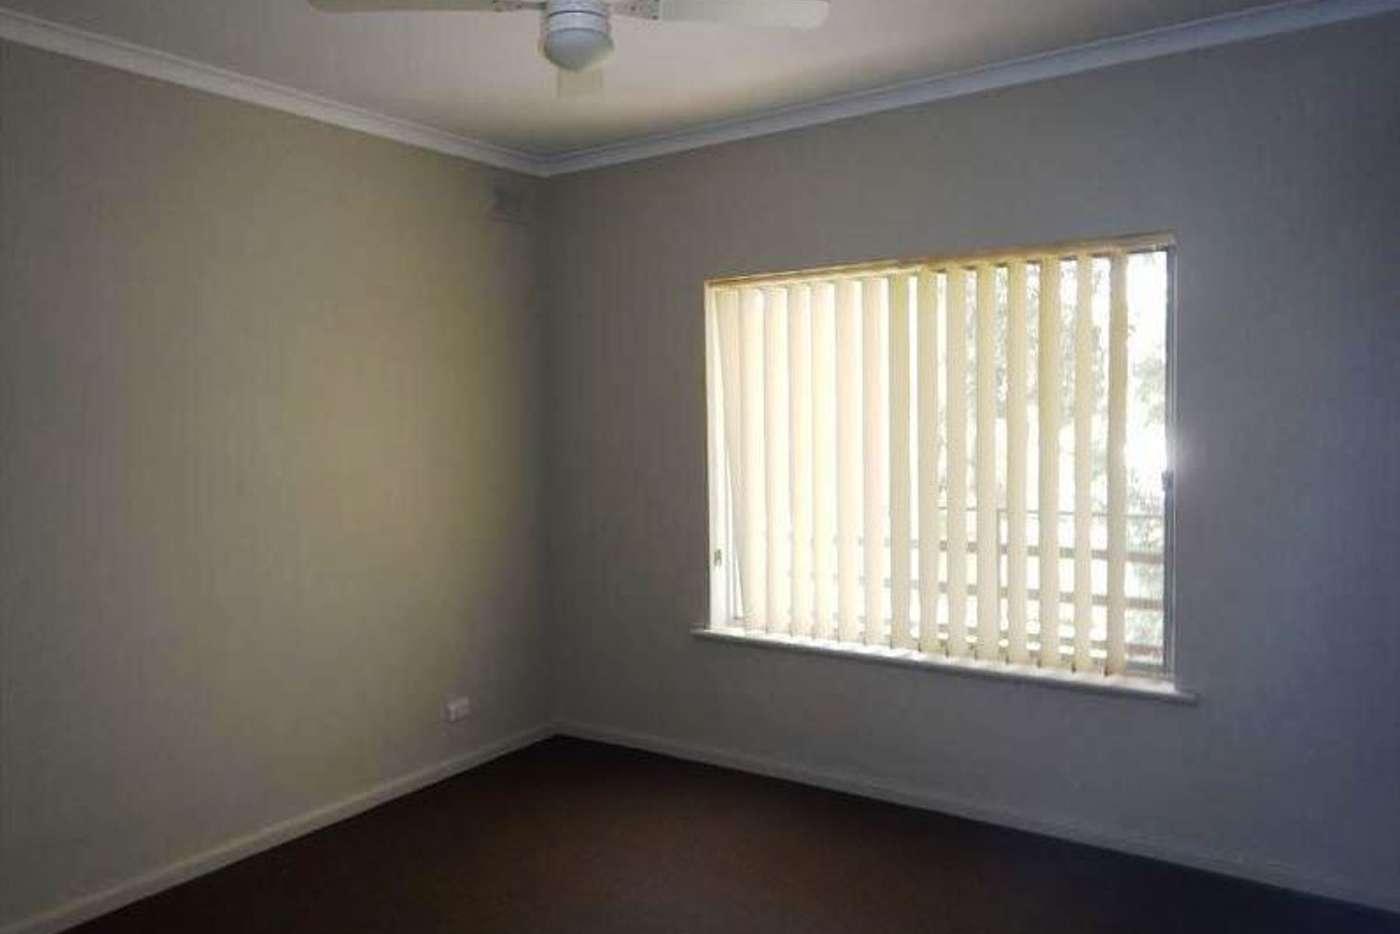 Sixth view of Homely unit listing, 6/38 MacFarlane Street, Glenelg North SA 5045